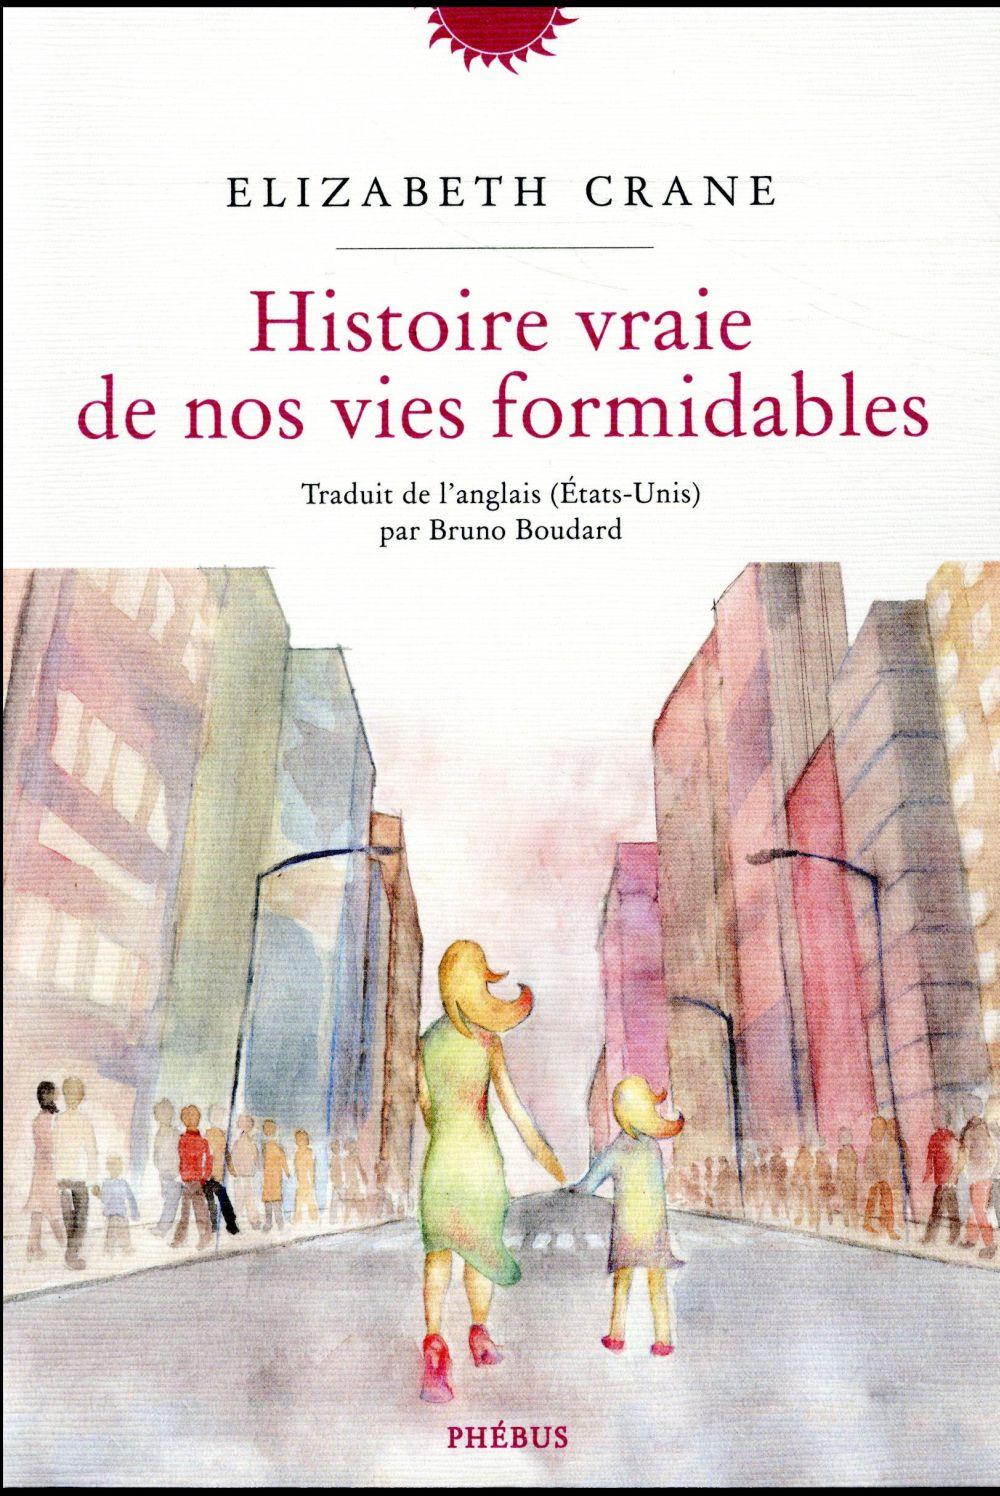 HISTOIRE VRAIE DE NOS VIES FORMIDABLES